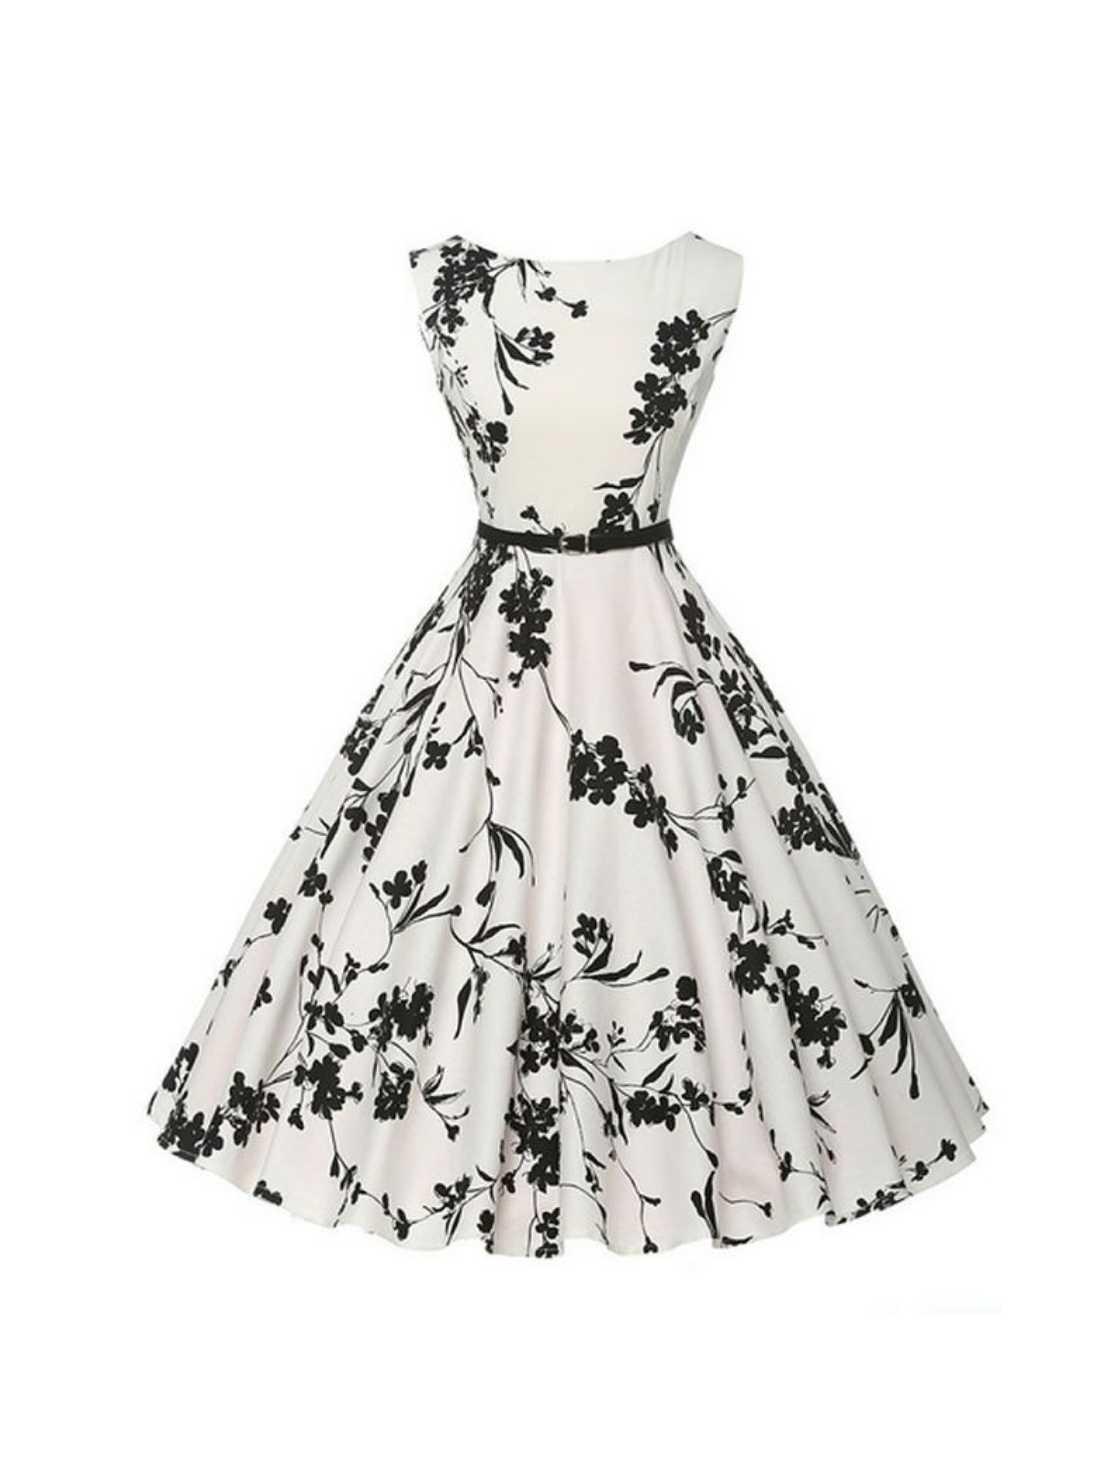 Printed One-Piece Dresses